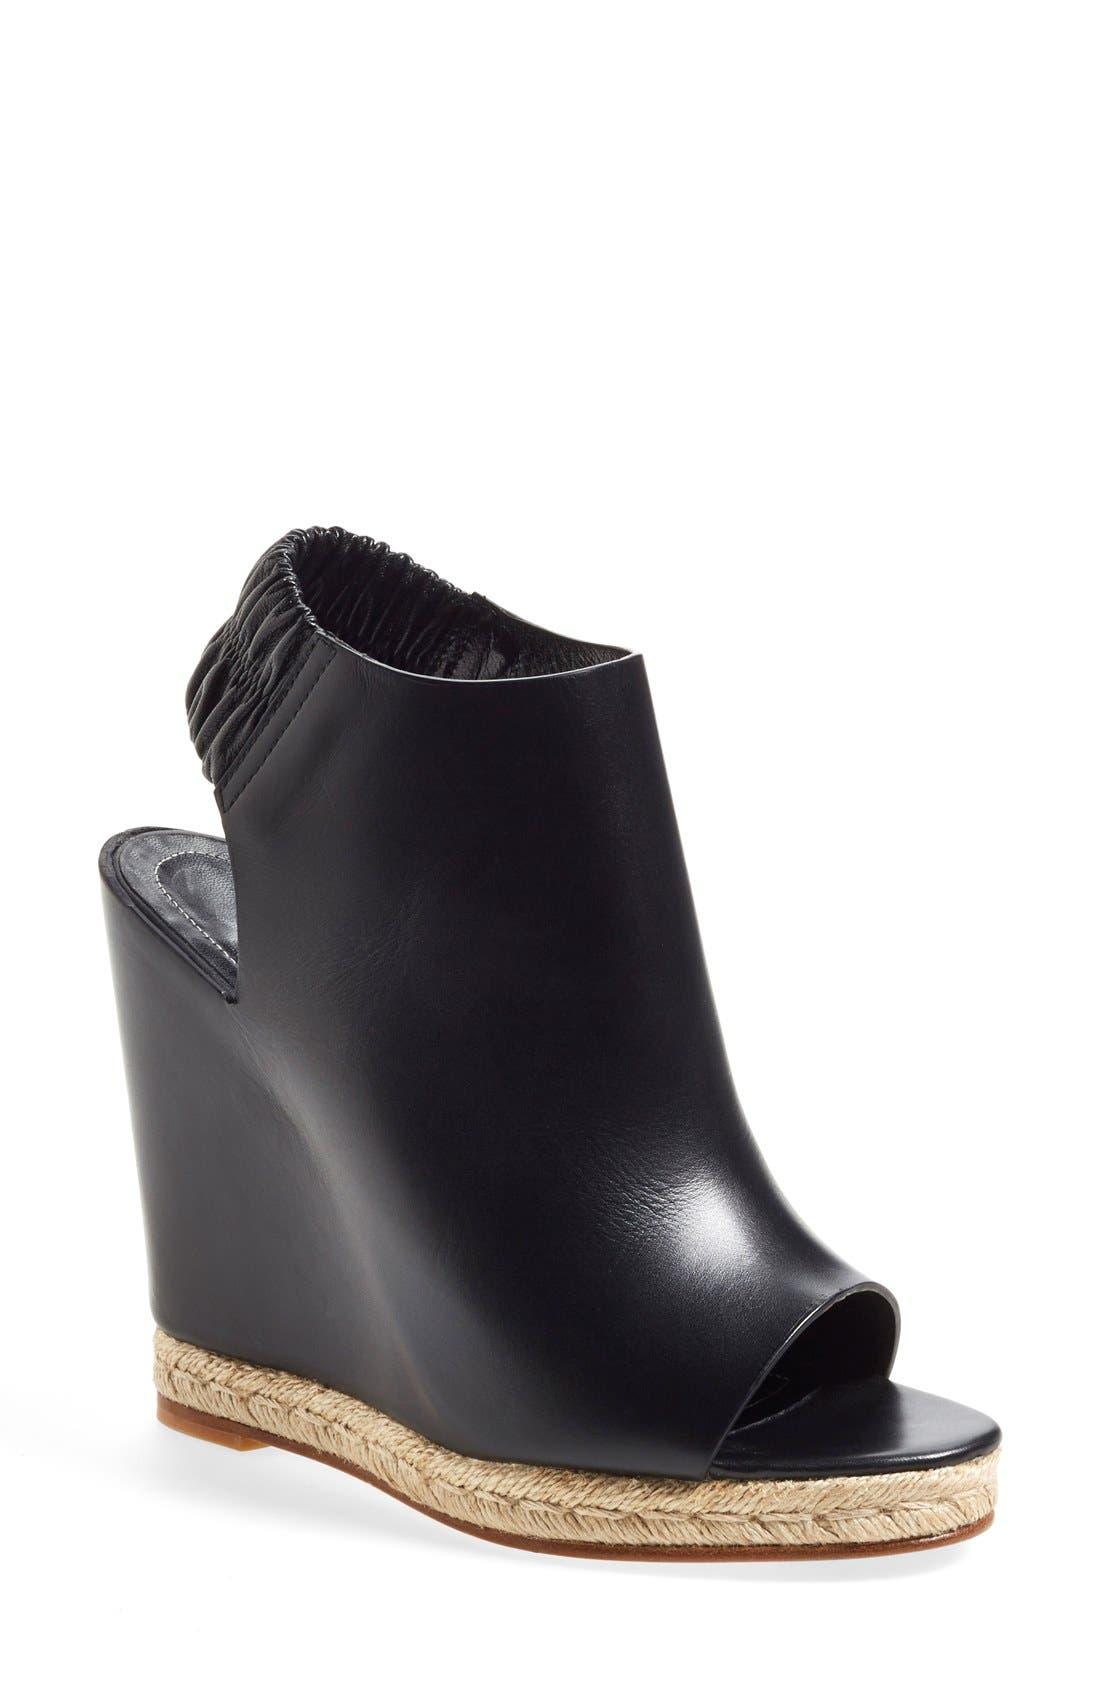 Alternate Image 1 Selected - Balenciaga Espadrille Wedge Sandal (Women)